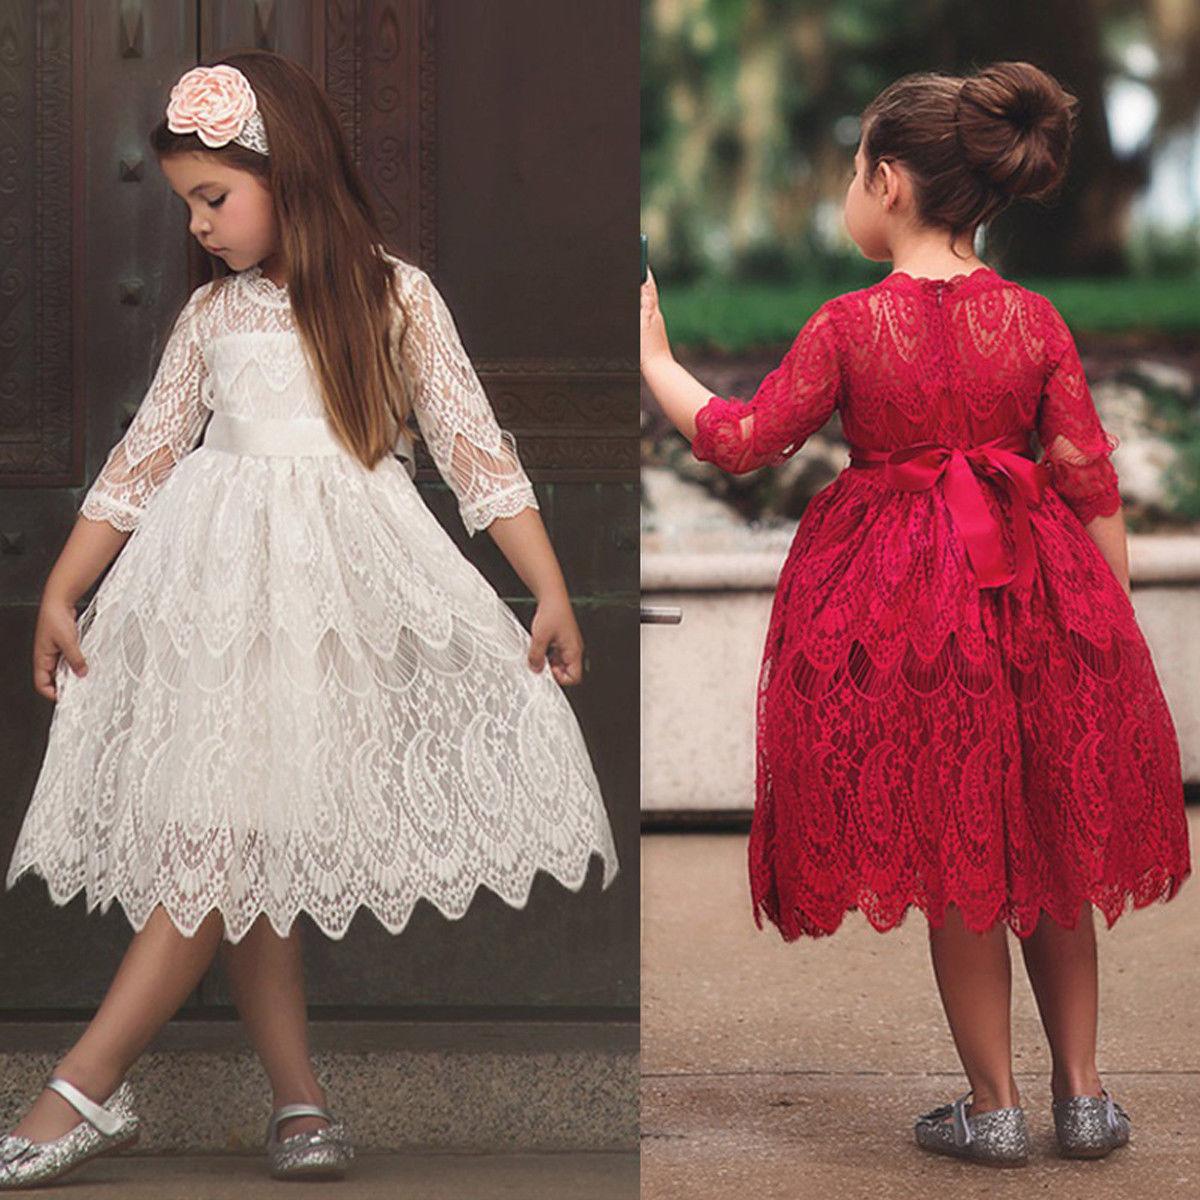 Flower Girls Princess  ▪  Dress Kids Baby Party Lace Tulle Tutu Dress